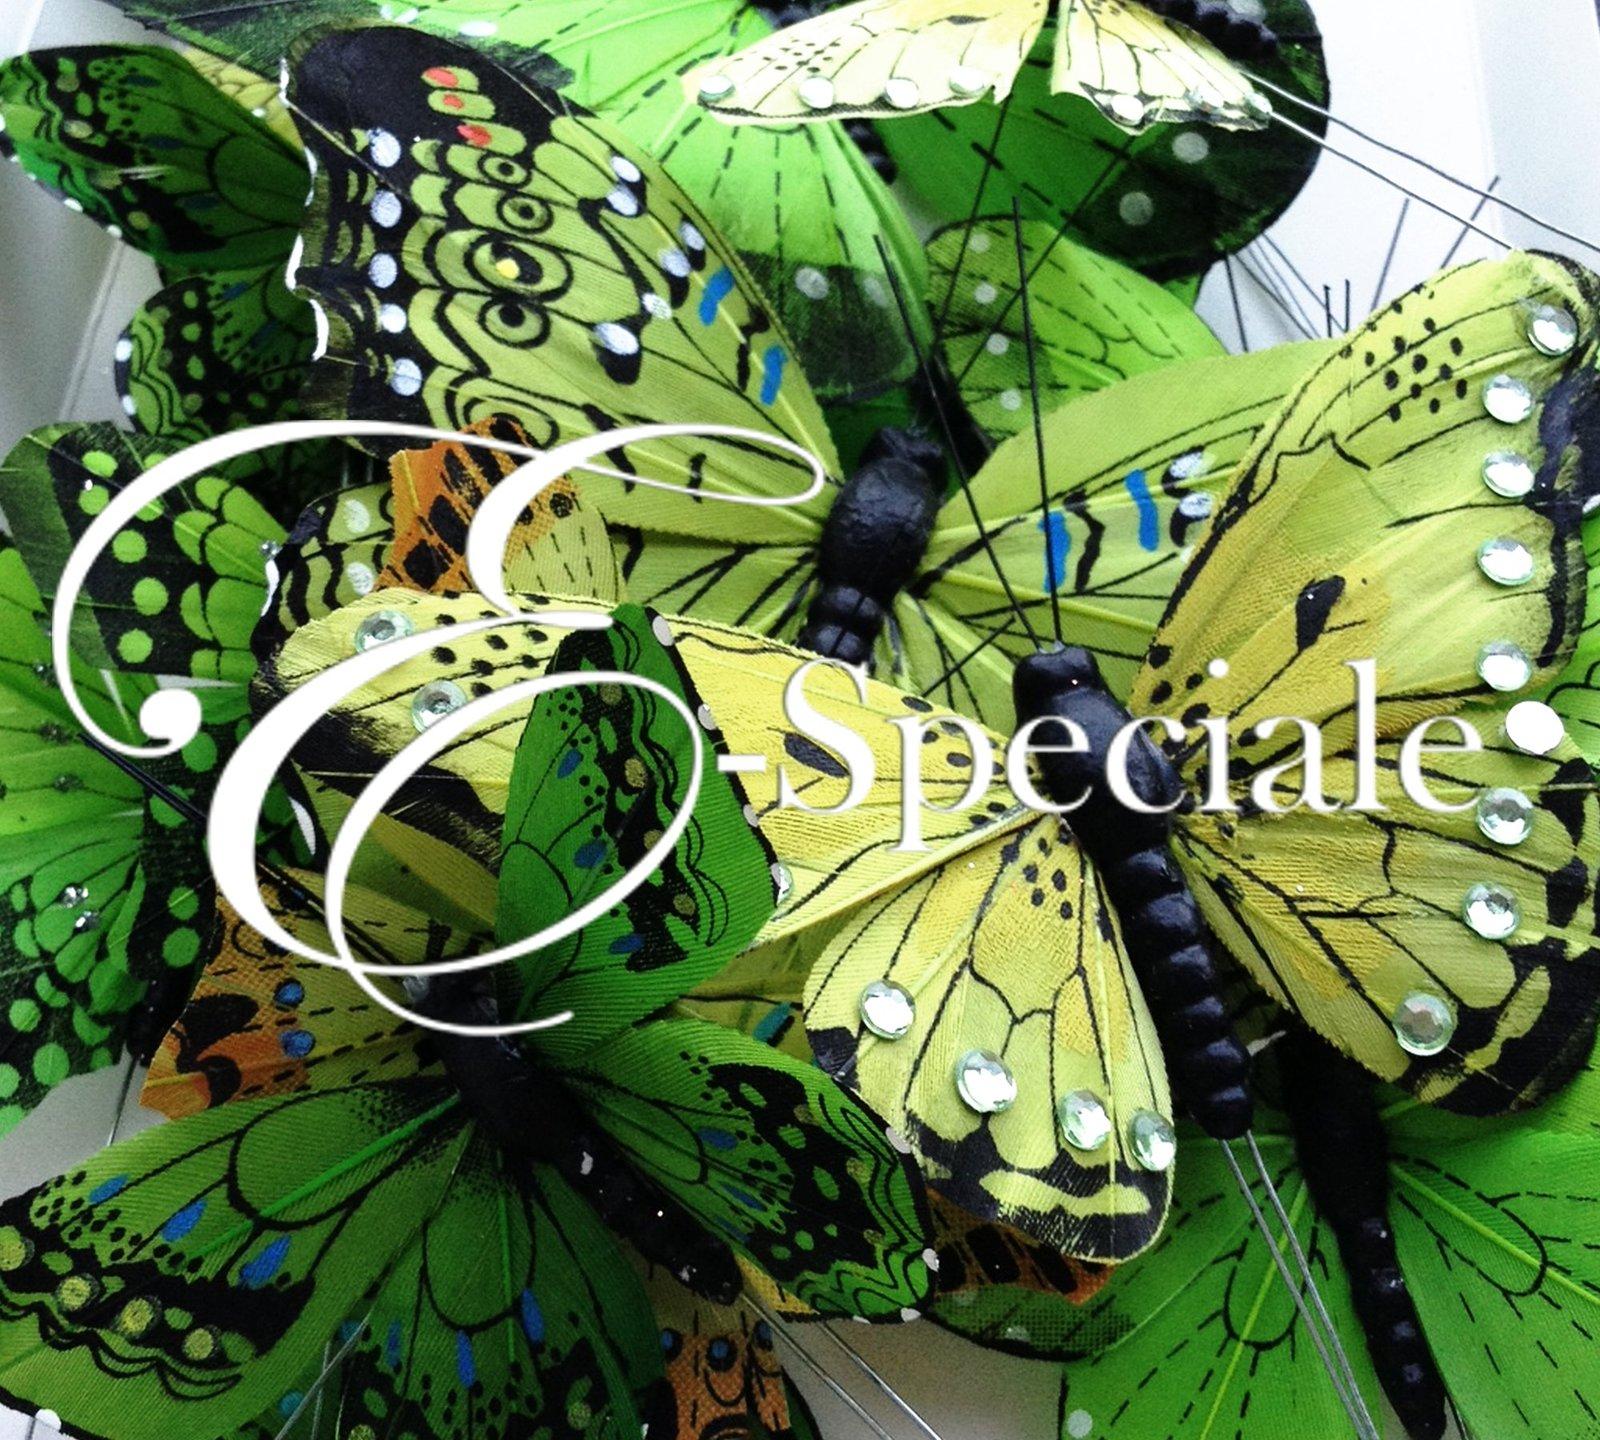 Farfalle decorative 24pz shop per colore verde for Farfalle decorative per muri